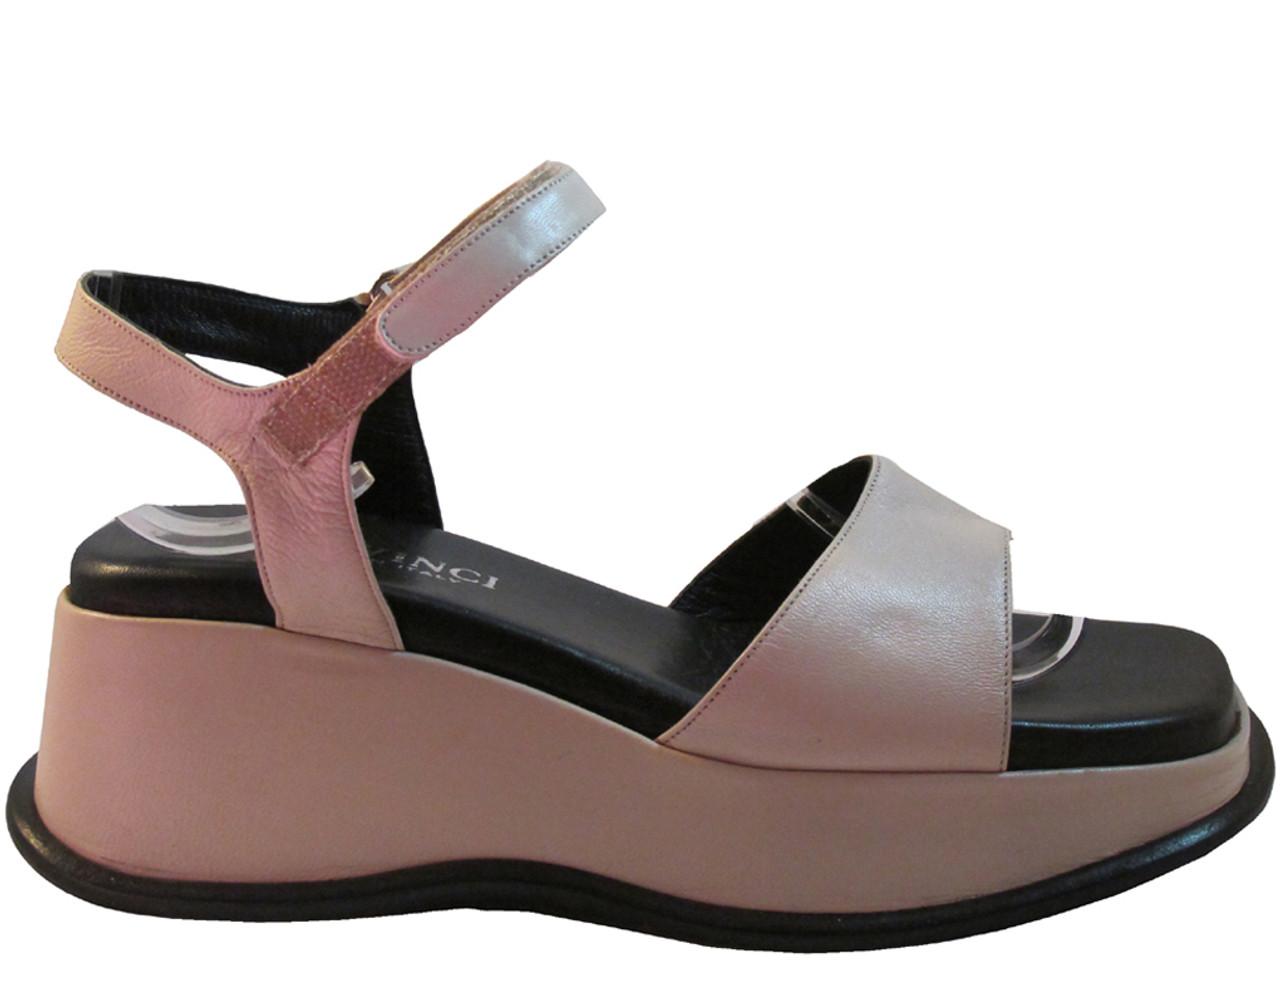 Marco Moreo Women's 2022 Italian Leather Wedge Sandals Beige